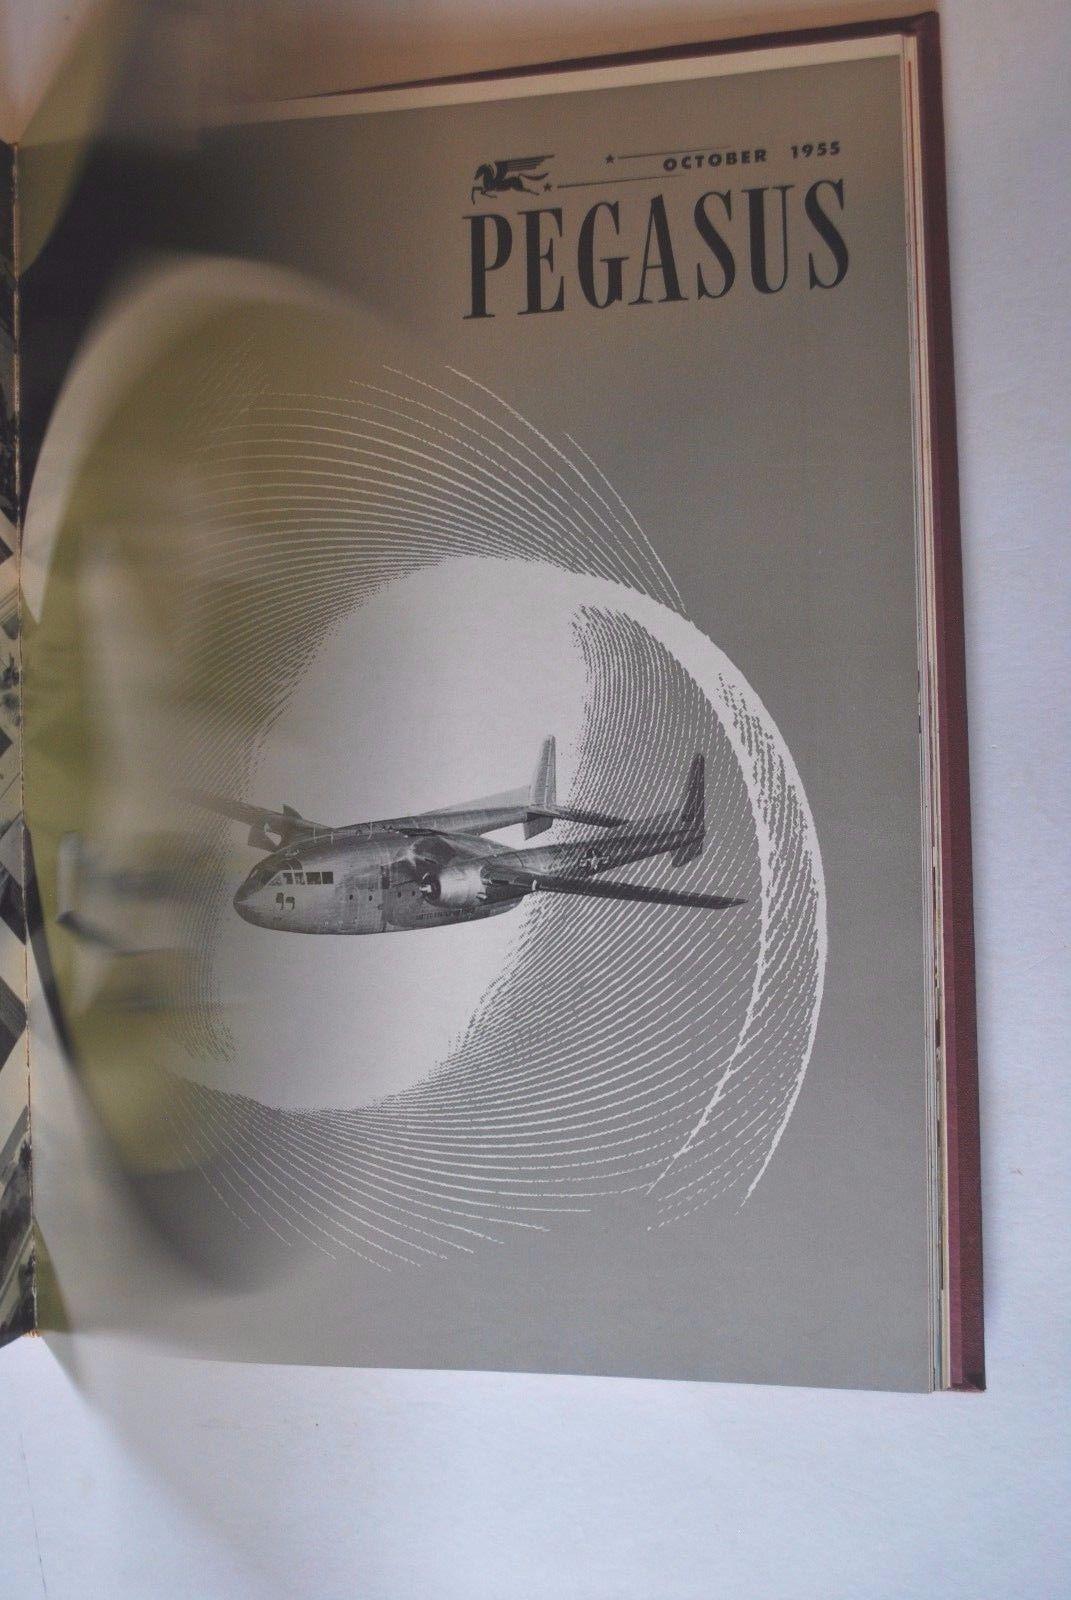 Pegasus Full Year of Bound Aviation Magazines 1955